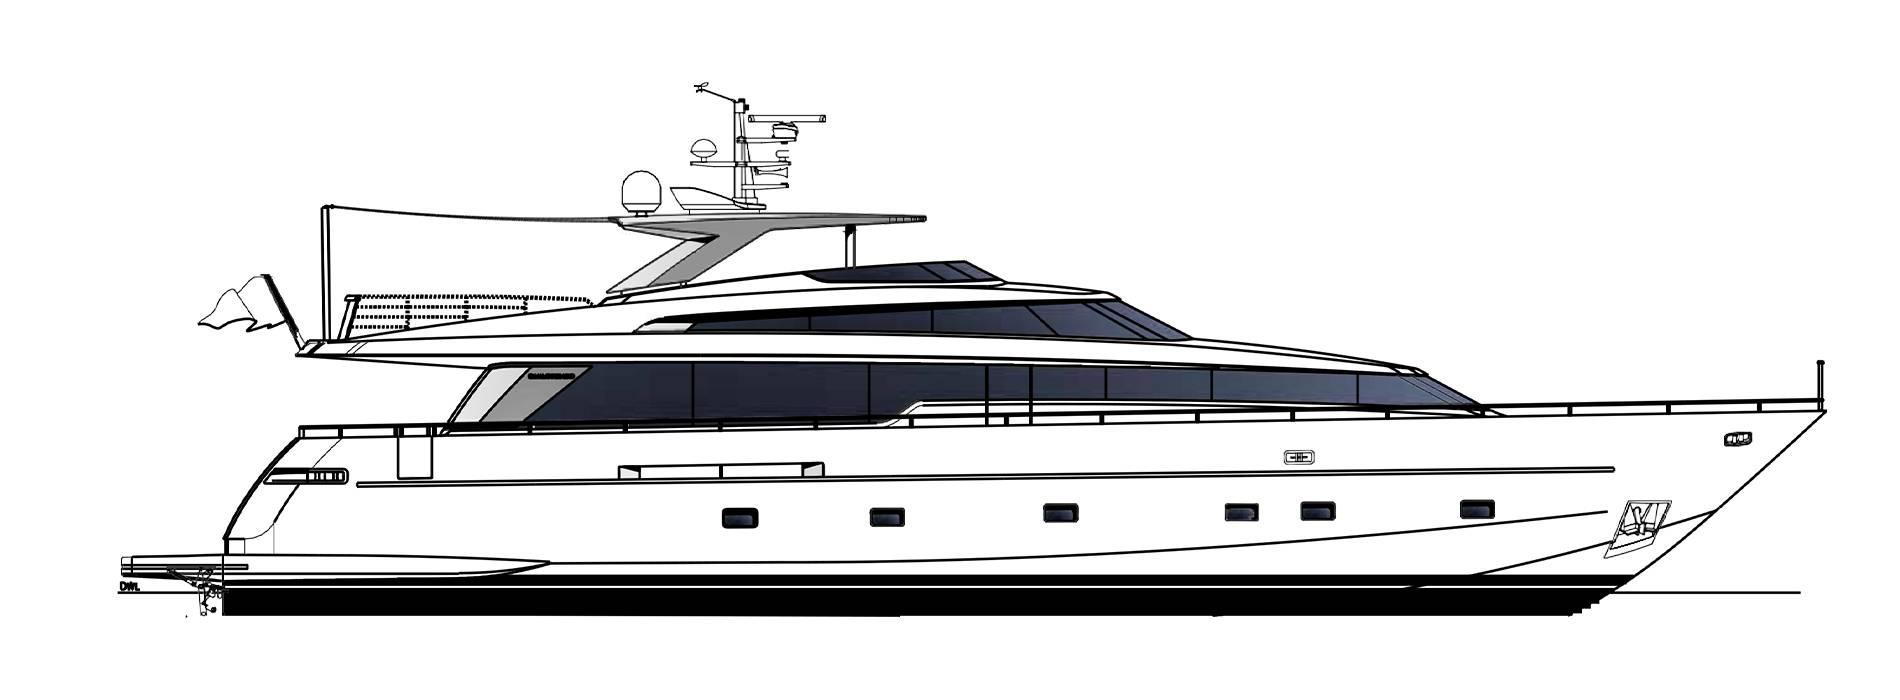 Sanlorenzo Yachts SL96-623 Profil